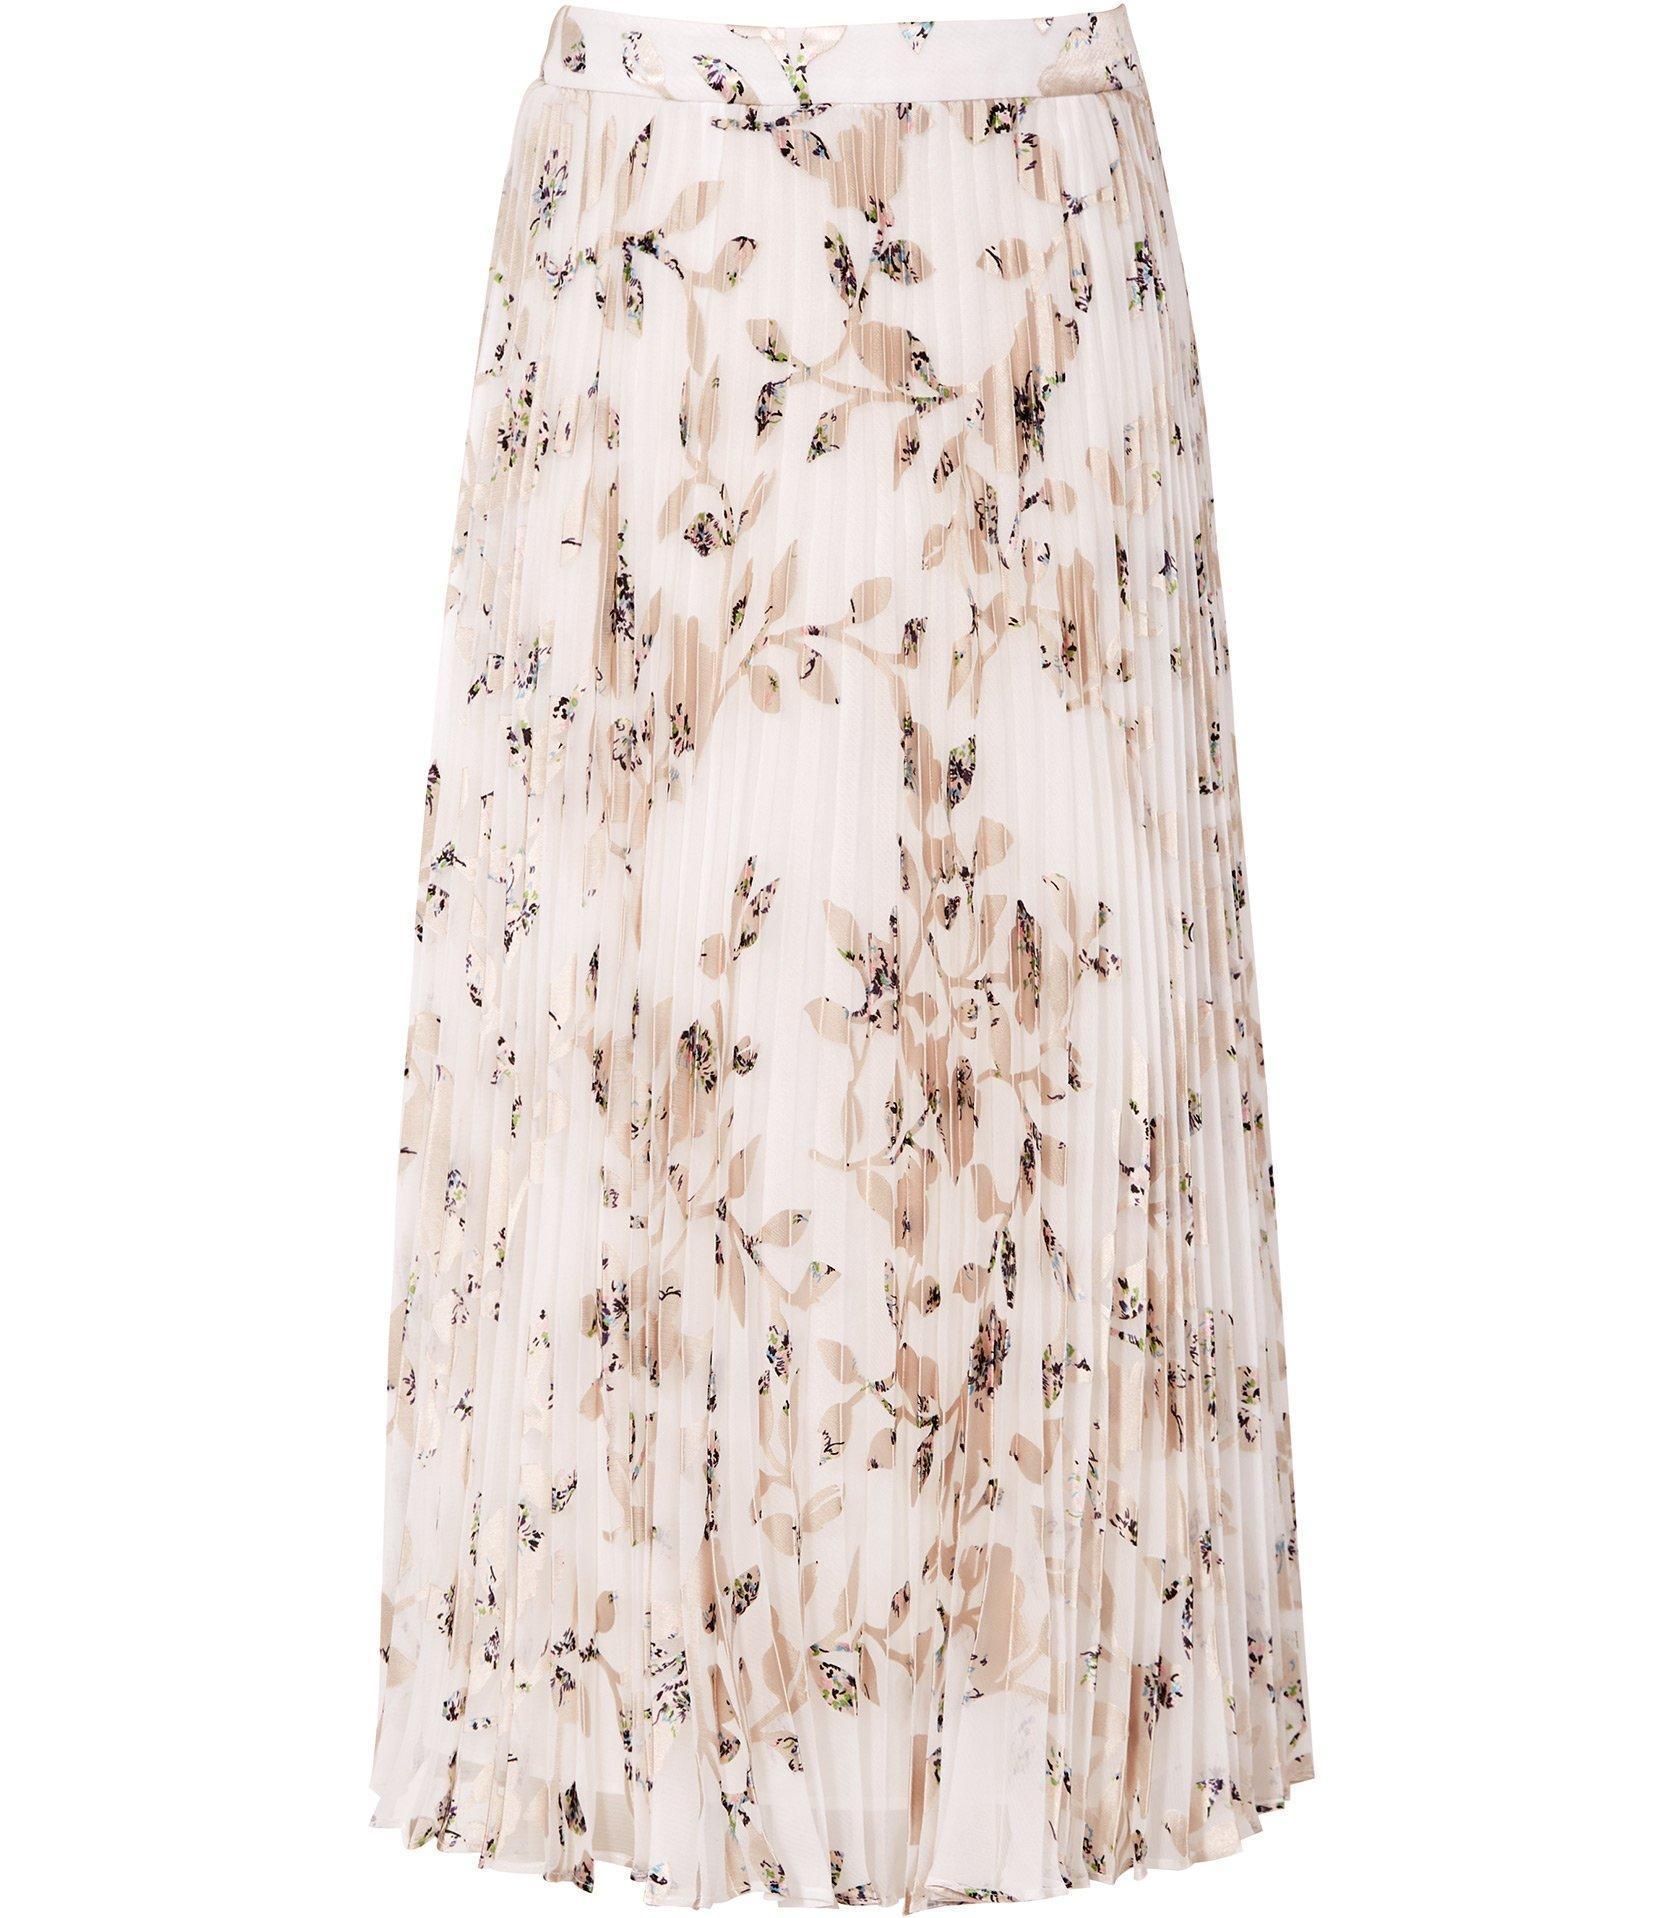 d7646dc1877f4 Reiss Alisandra - Floral Print Pleated Skirt - Lyst